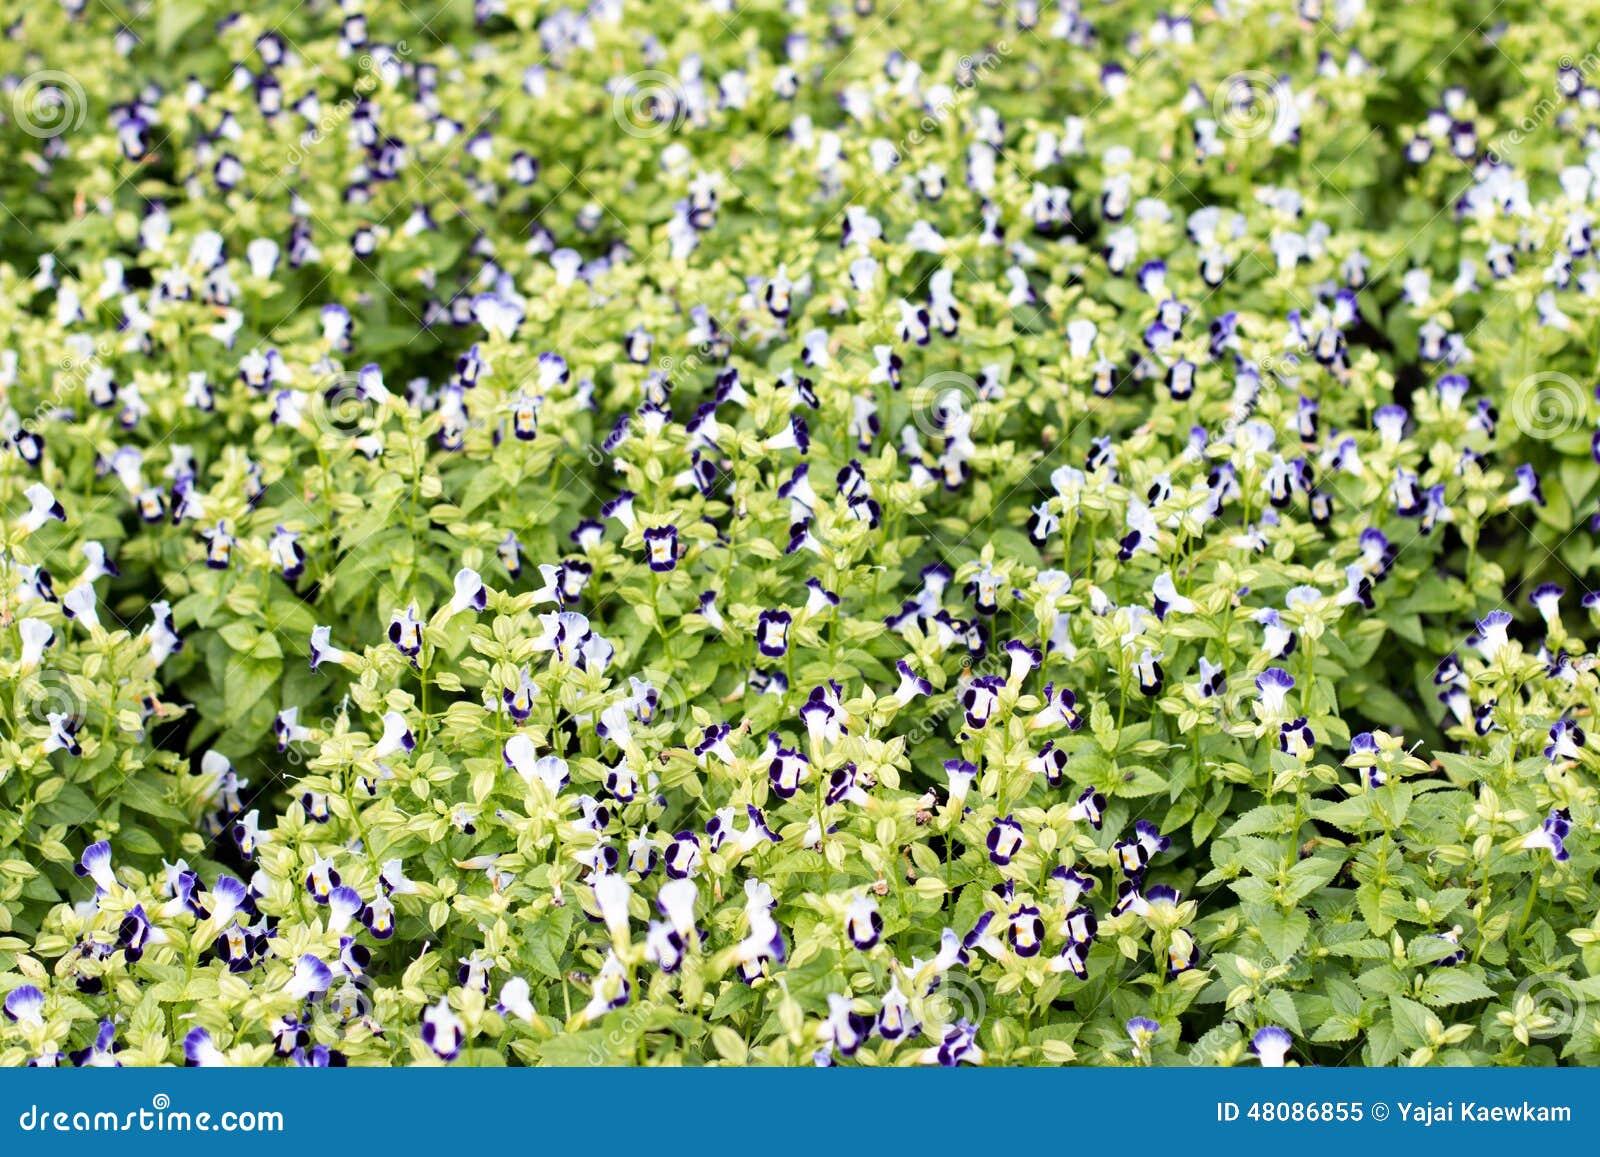 Small blue flower shrub stock image image of shrub flower 48086855 mightylinksfo